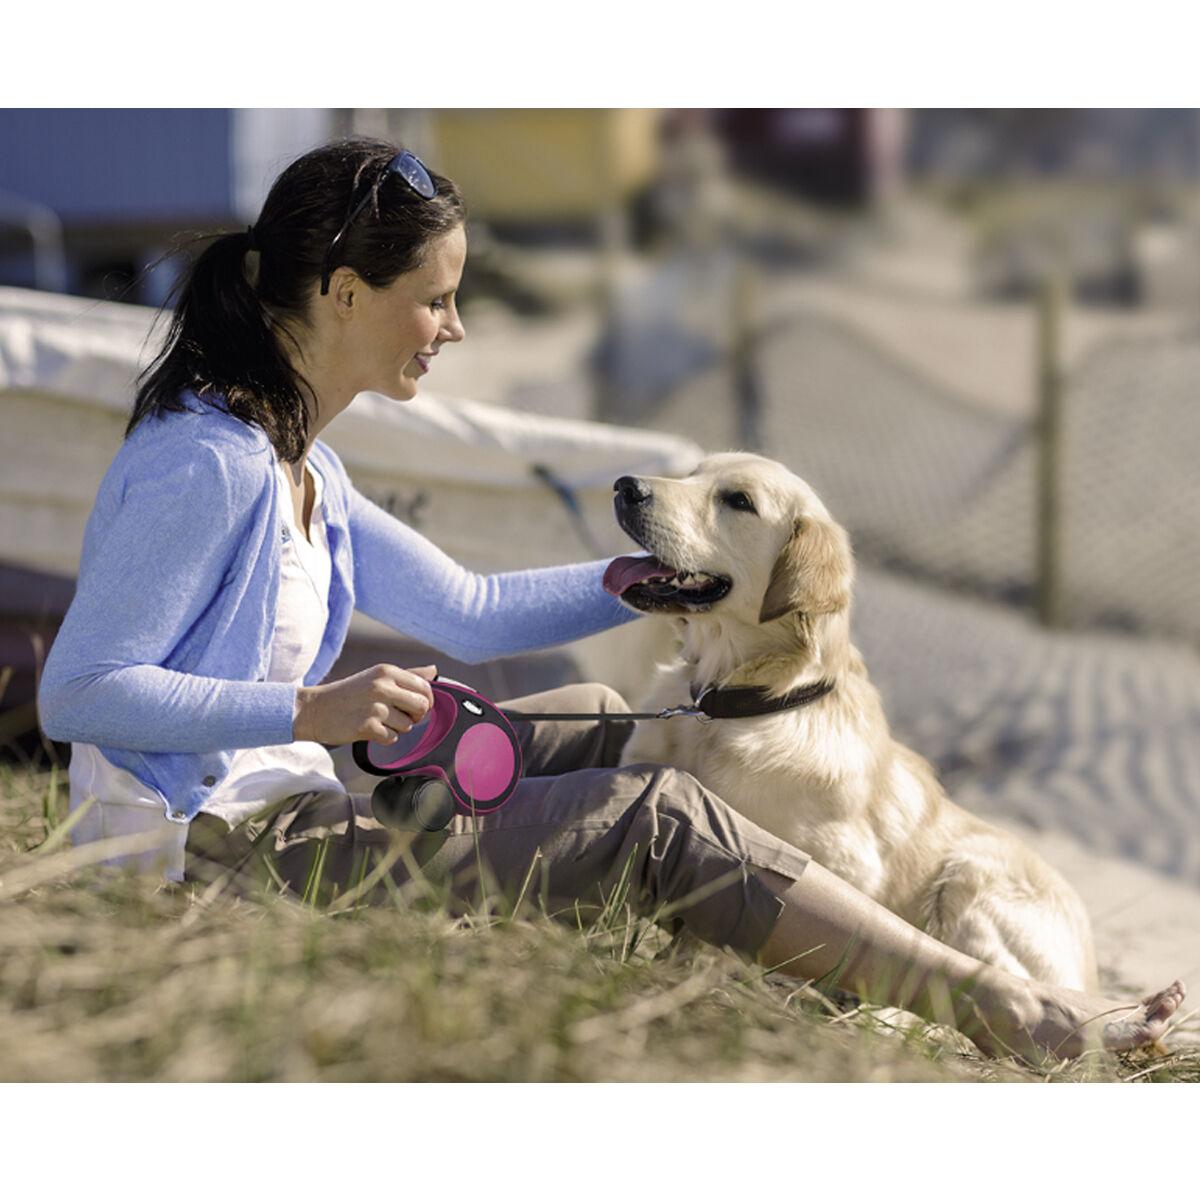 FLEXI FLEXI FLEXI NEW COMFORT Gurtleine Gurt Rollleine Hundeleine Automatik Leine Hunde  | Hochwertig  d3cda4